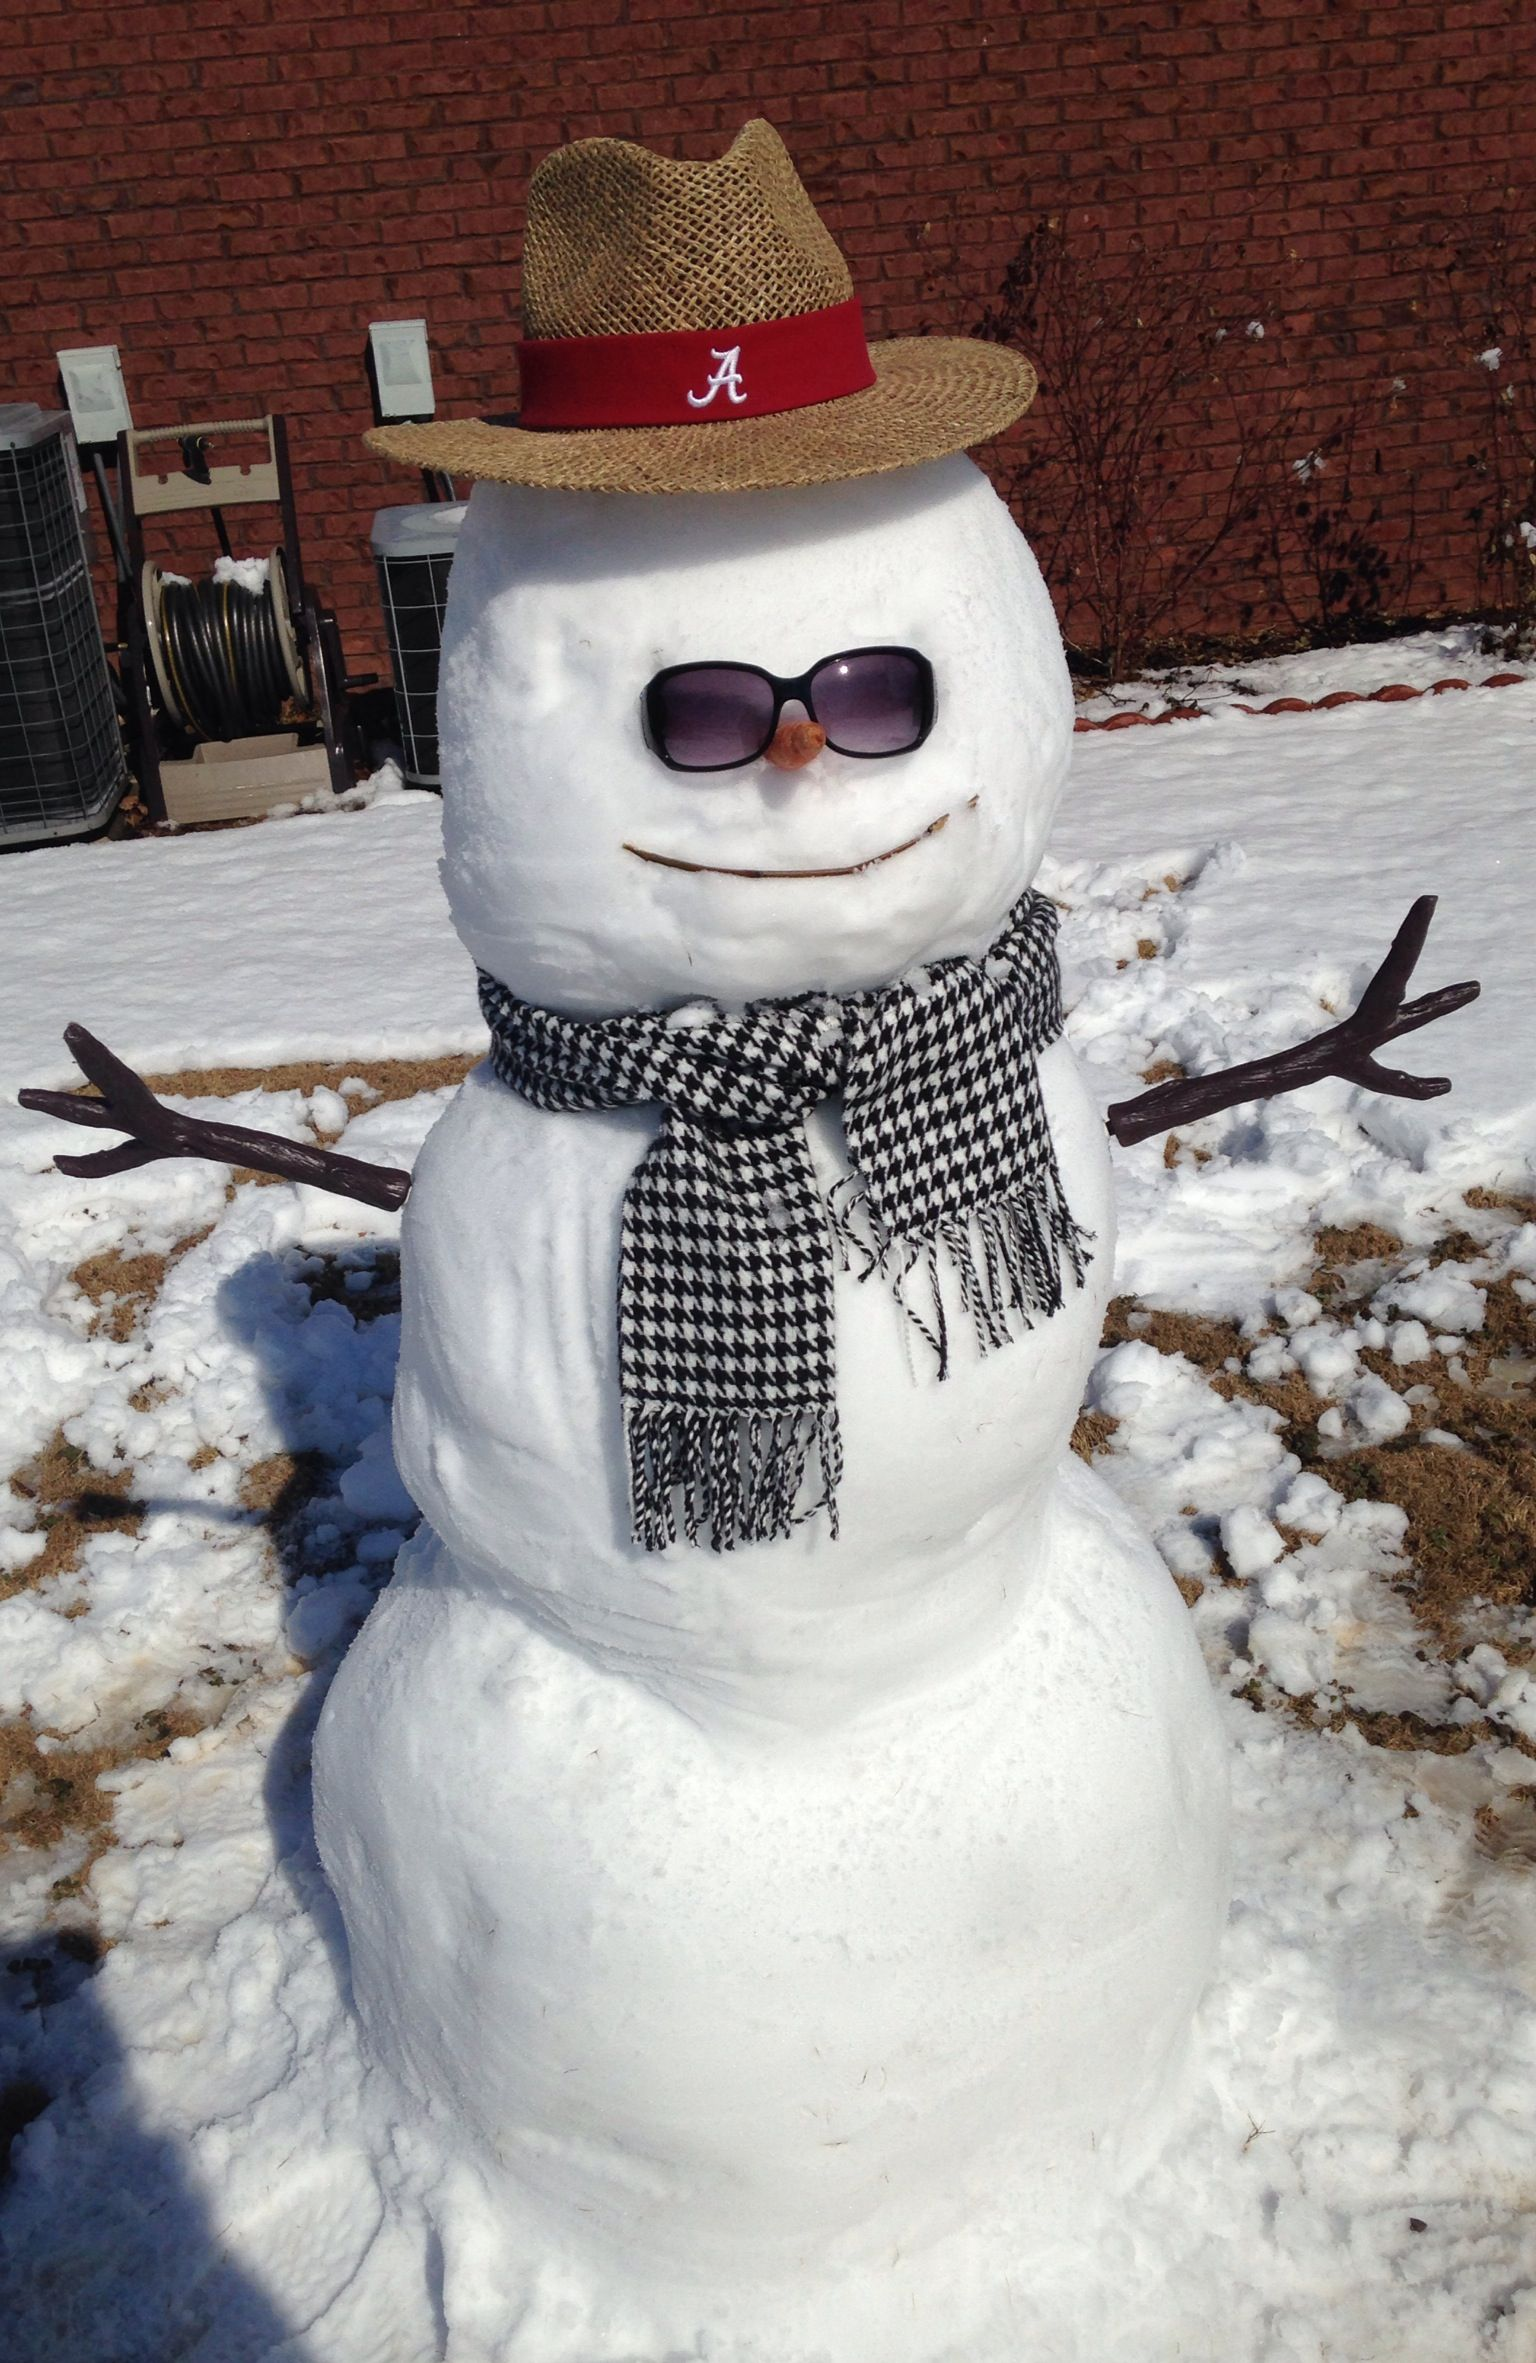 ROLL TIDE SNOWMAN!! Alabama football roll tide, Alabama